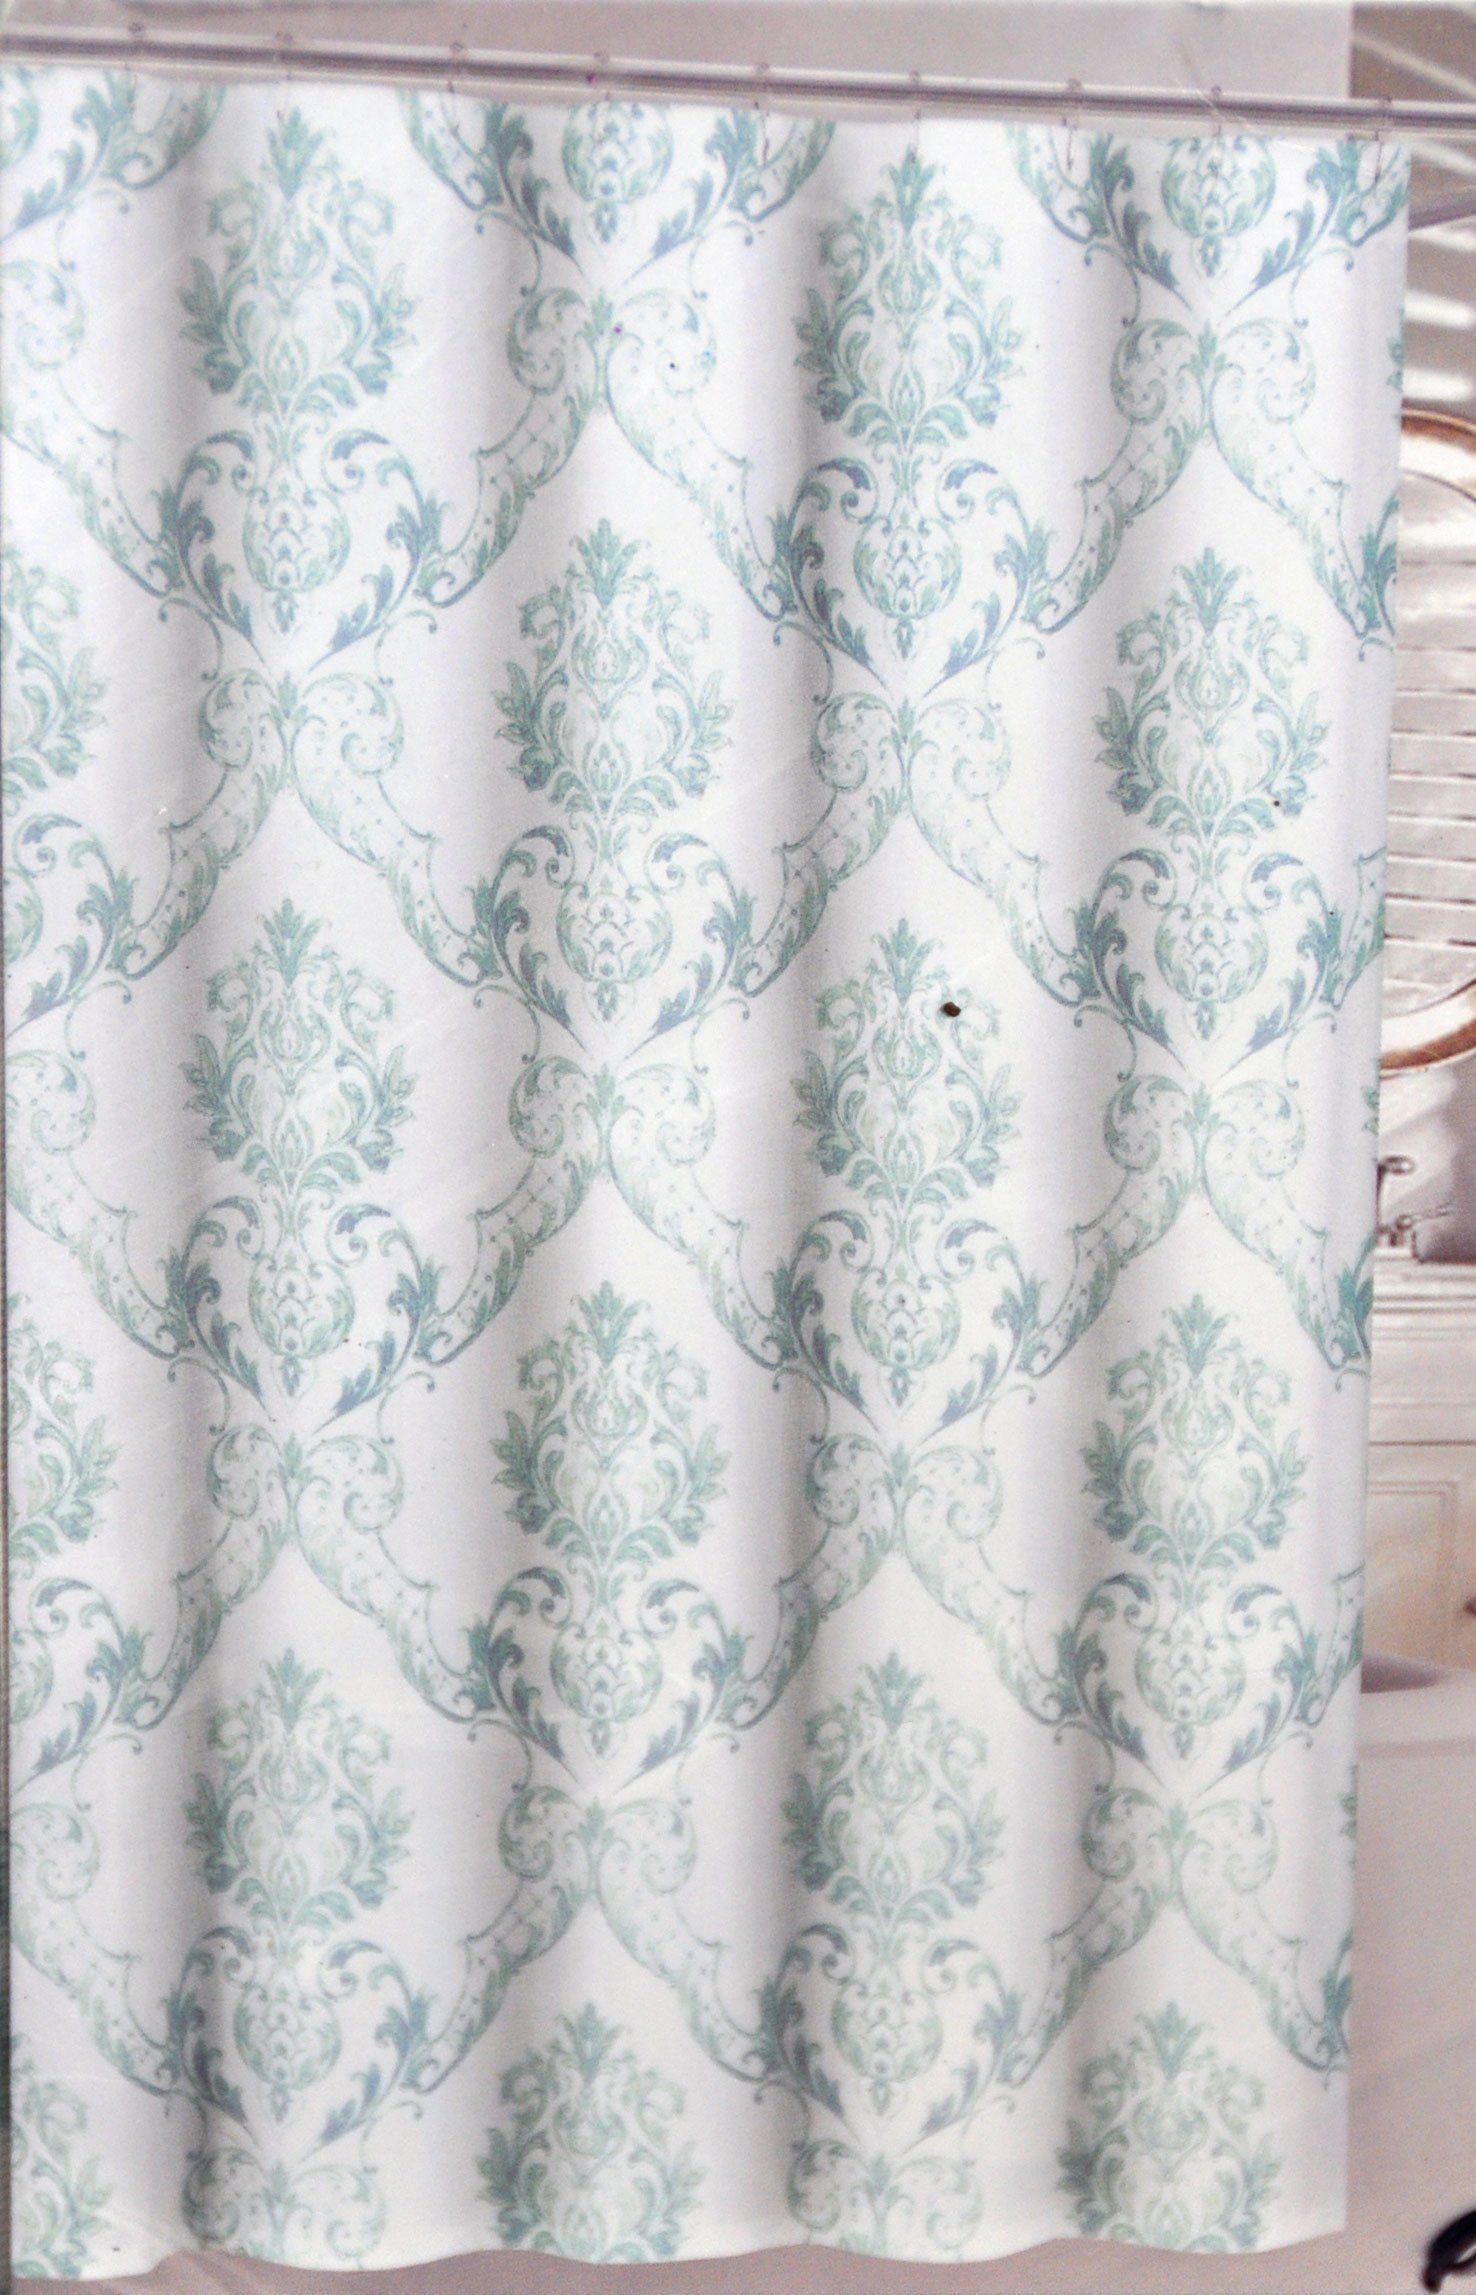 Tahari Chinoisserie Damask Fabric Shower Curtain Green Blue On